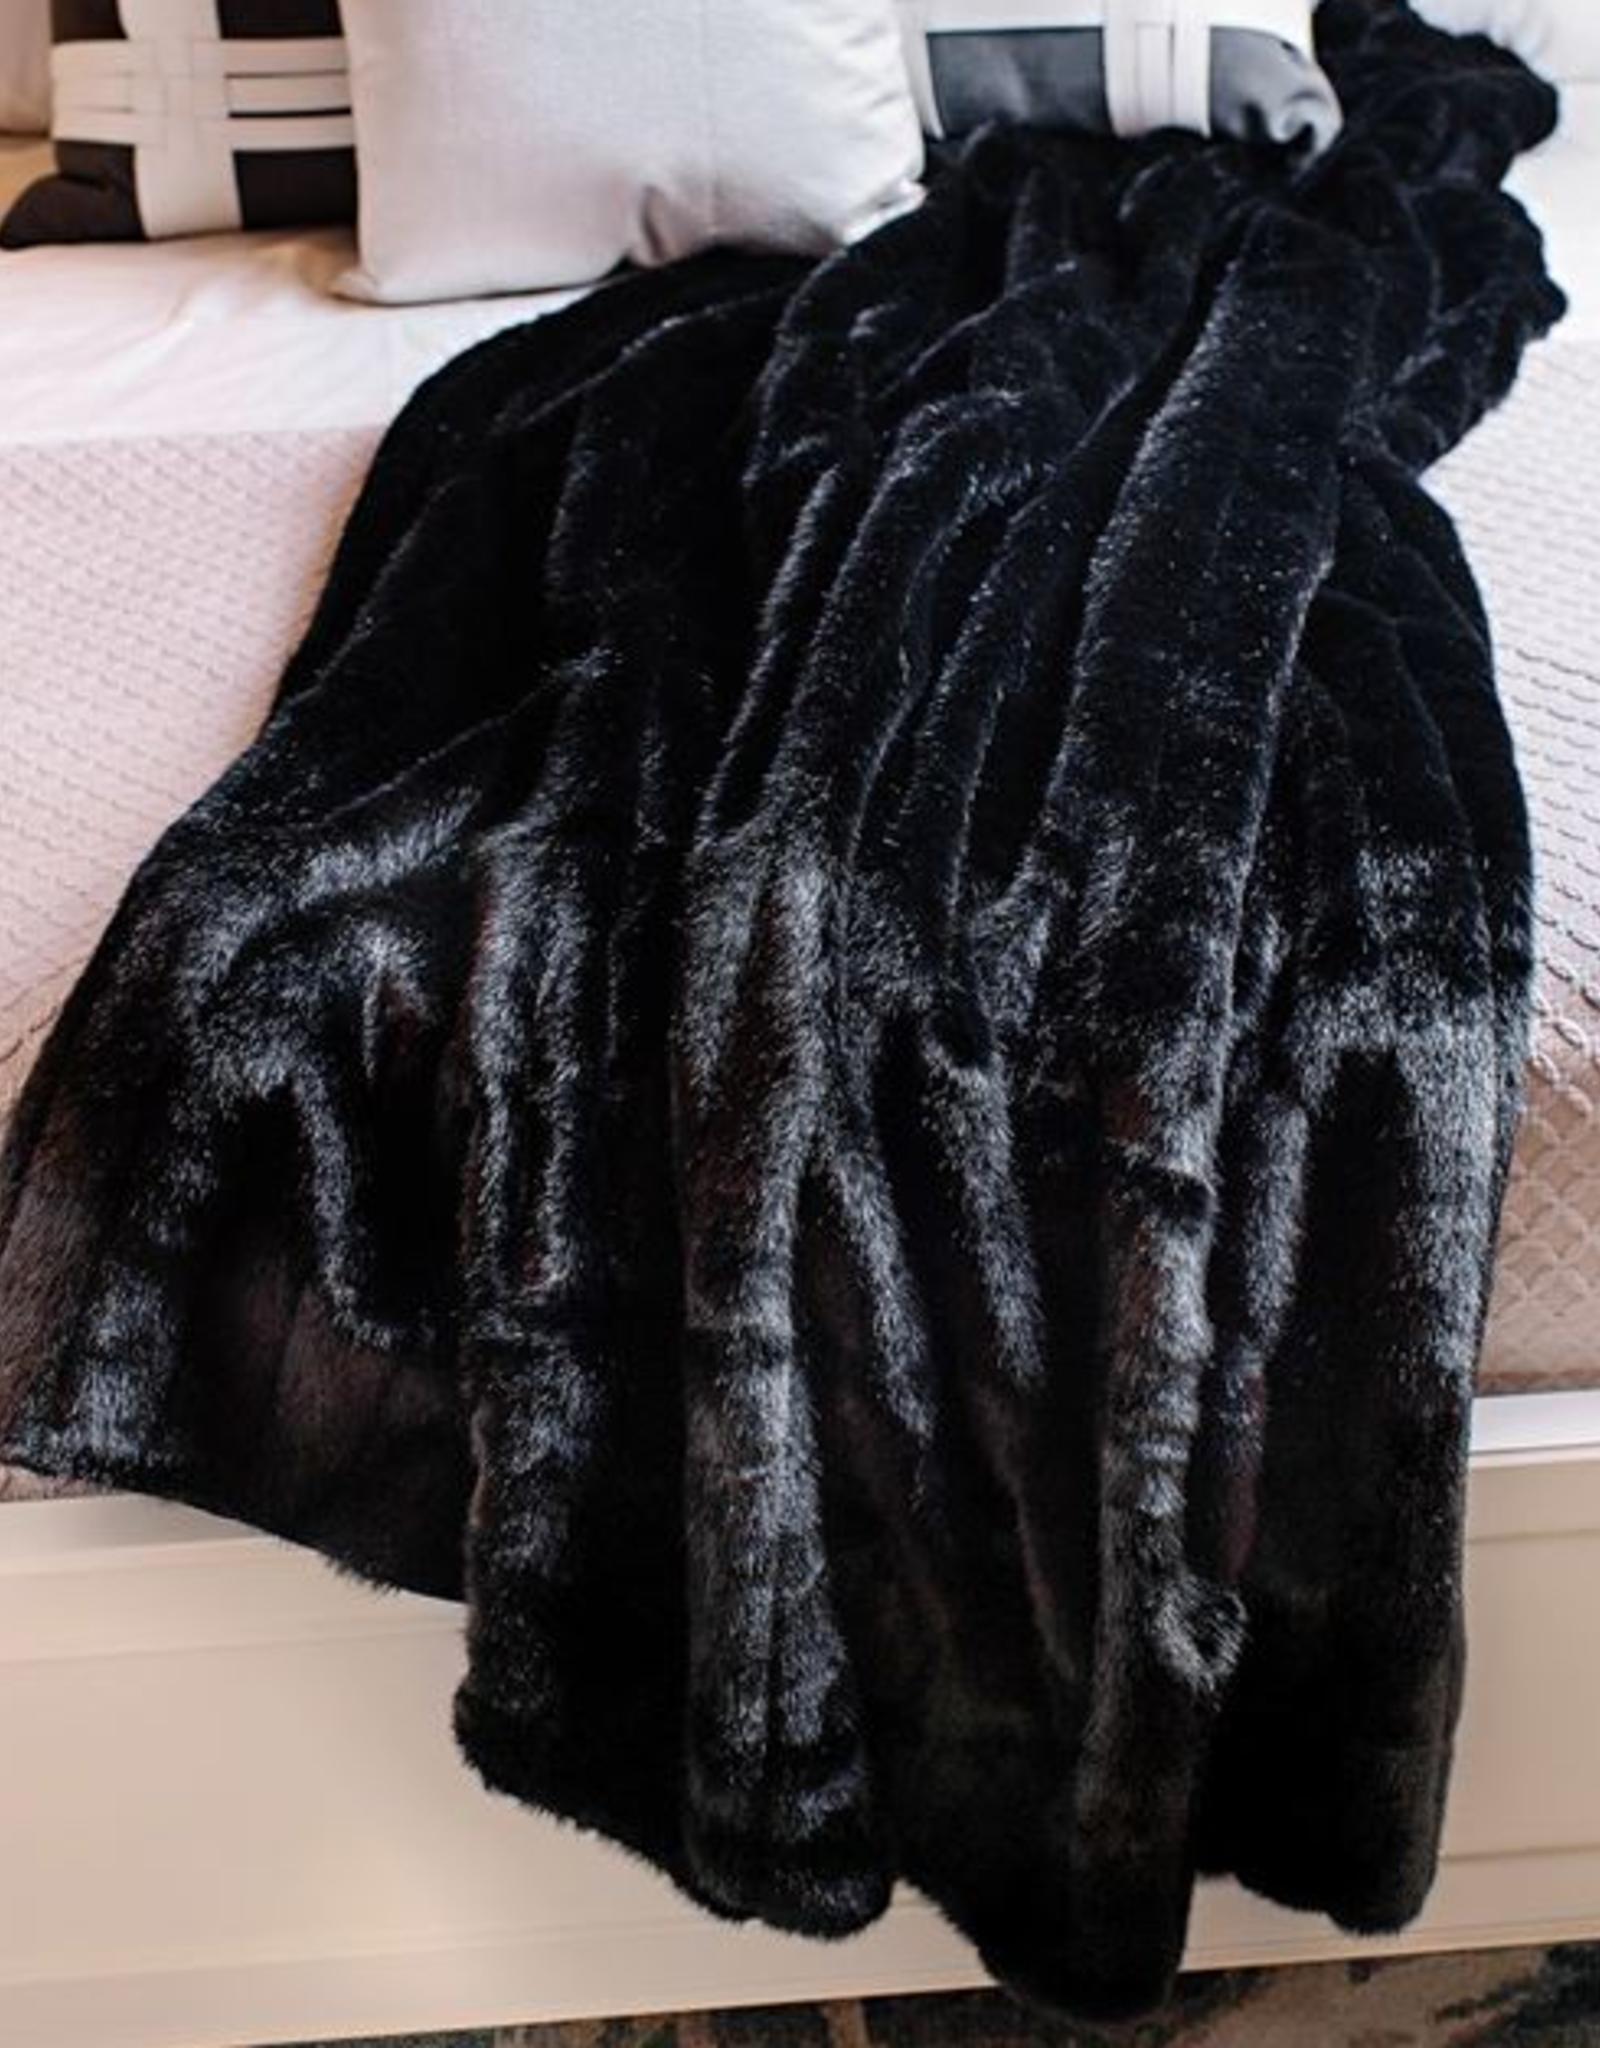 Fabulous Furs Throw Black Mink 60x72 Signature Series